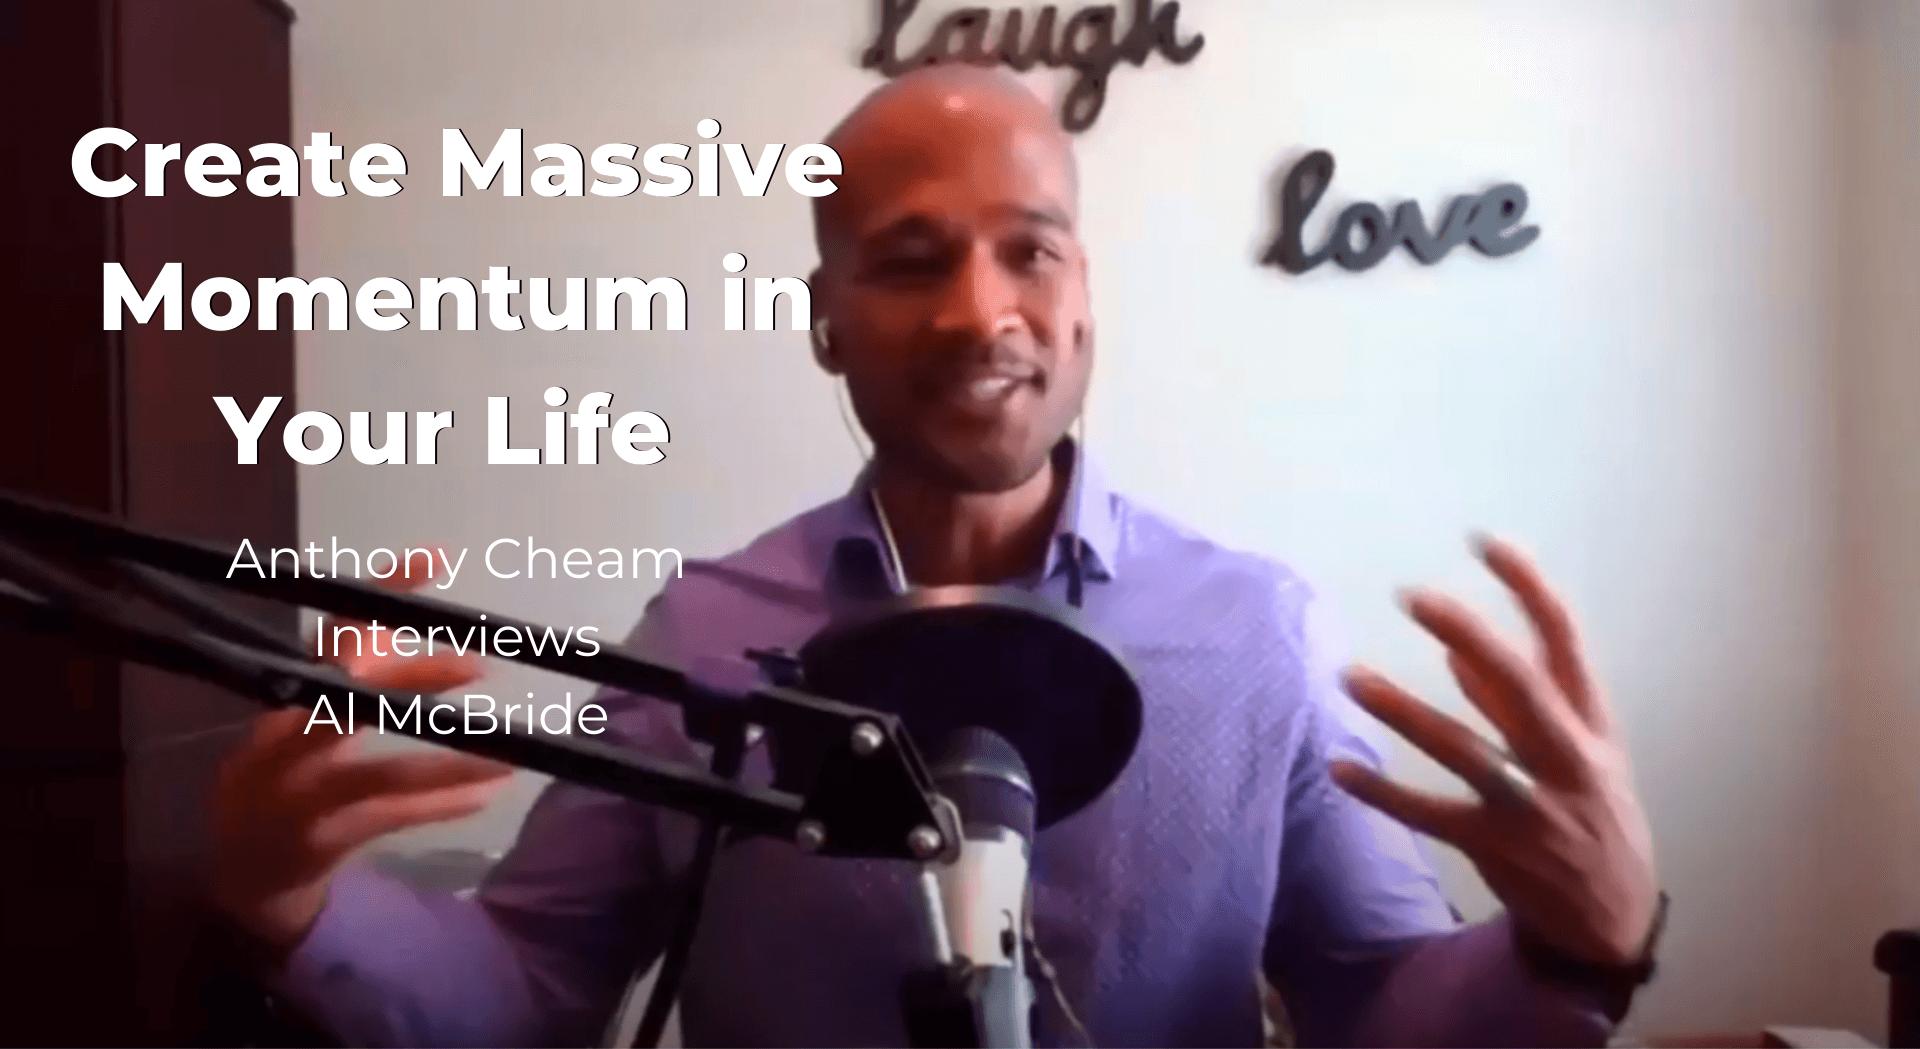 Create Massive Momentum in Your Life: Anthony Cheam Interviews Al McBride